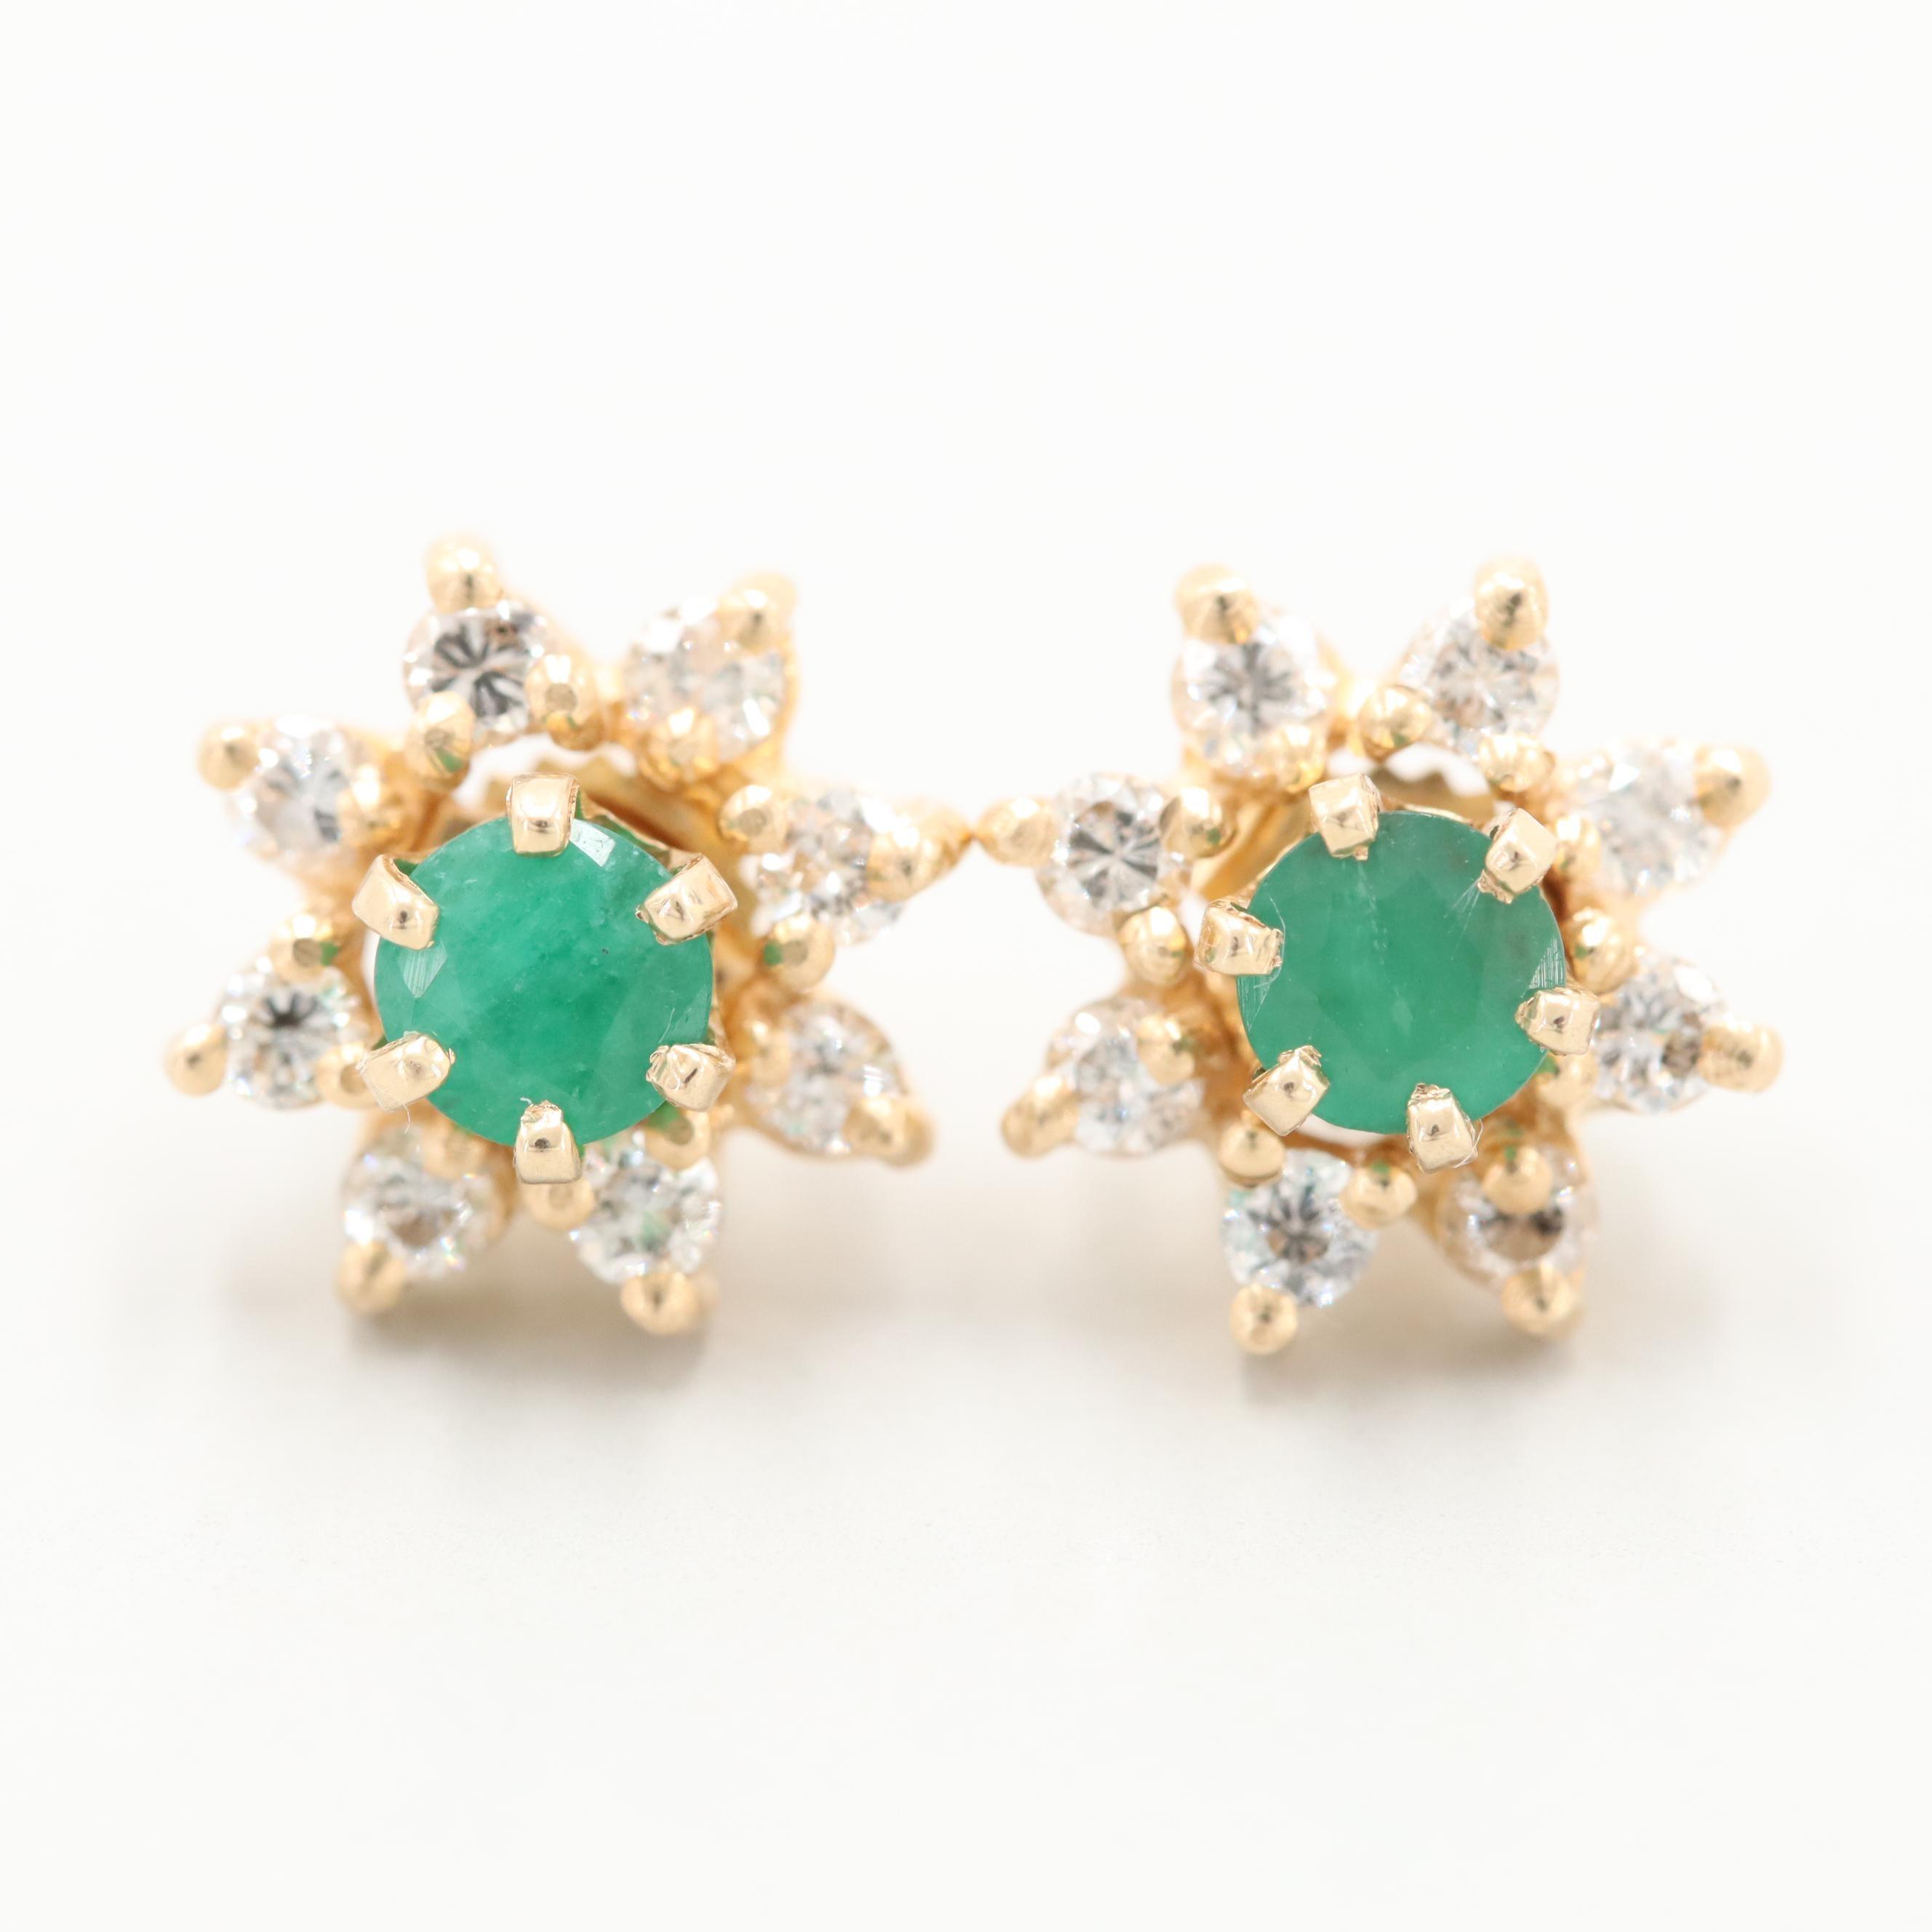 14K Yellow Gold Emerald Stud Earrings with diamond Jackets